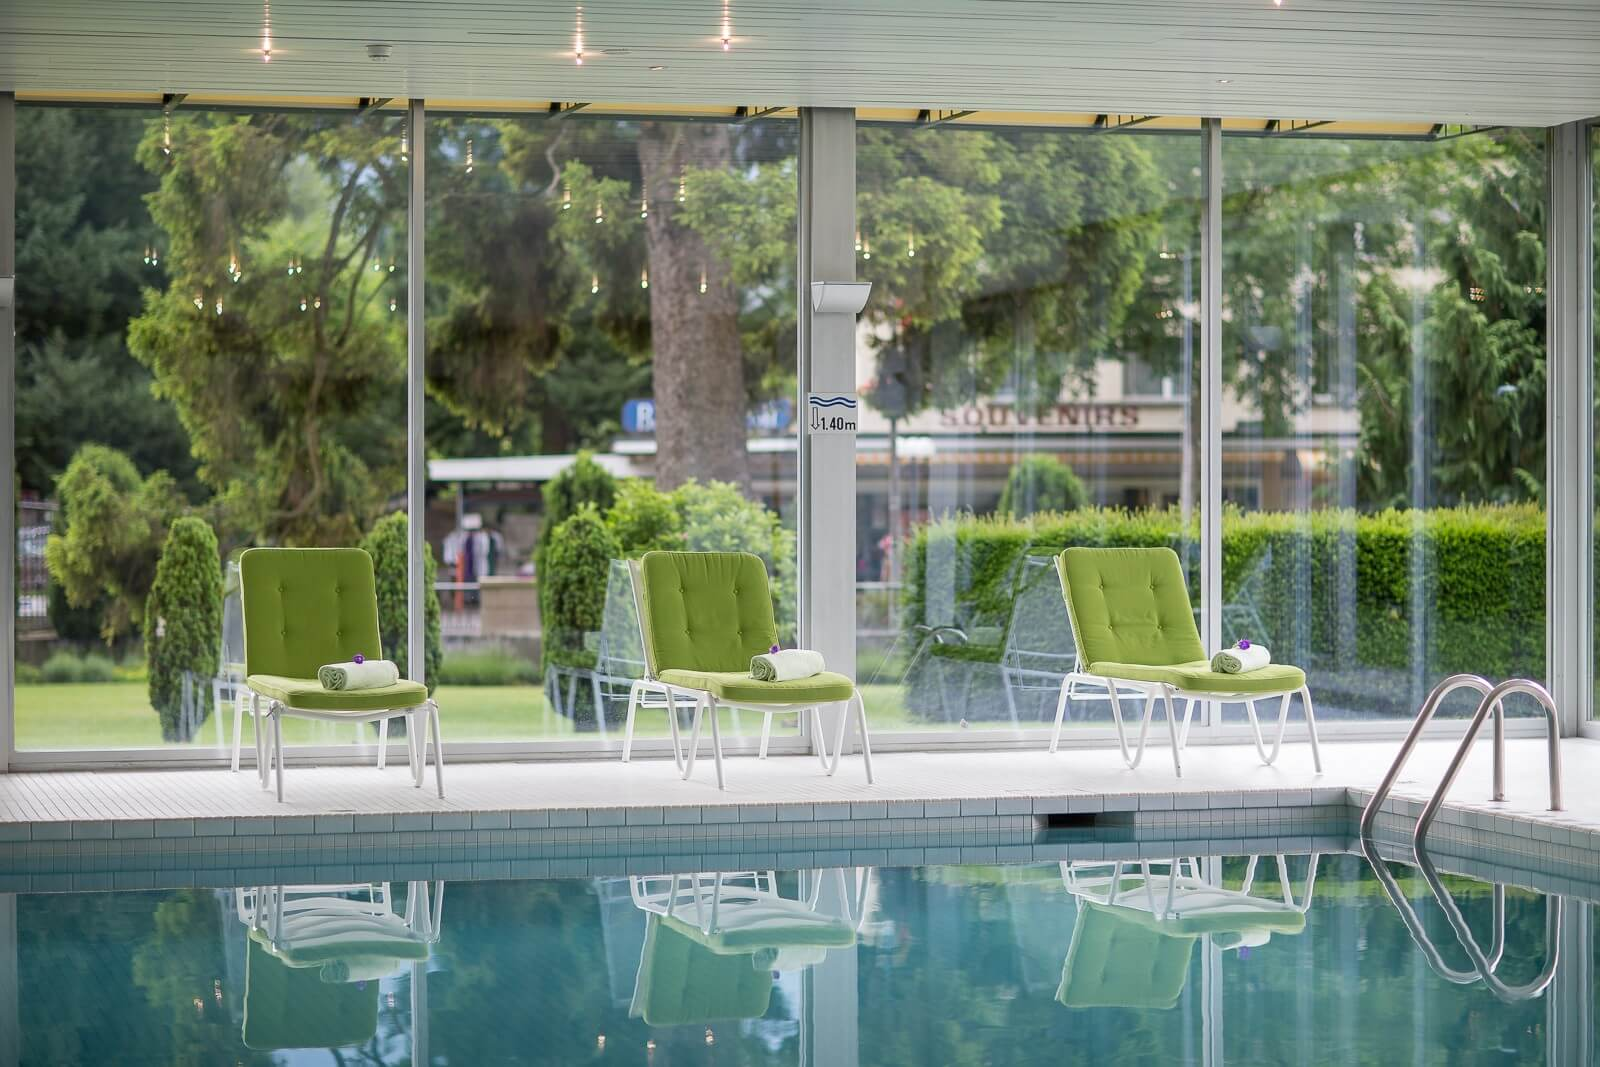 interlaken-clarins-beauty-center-pool-blick-nach-draussen